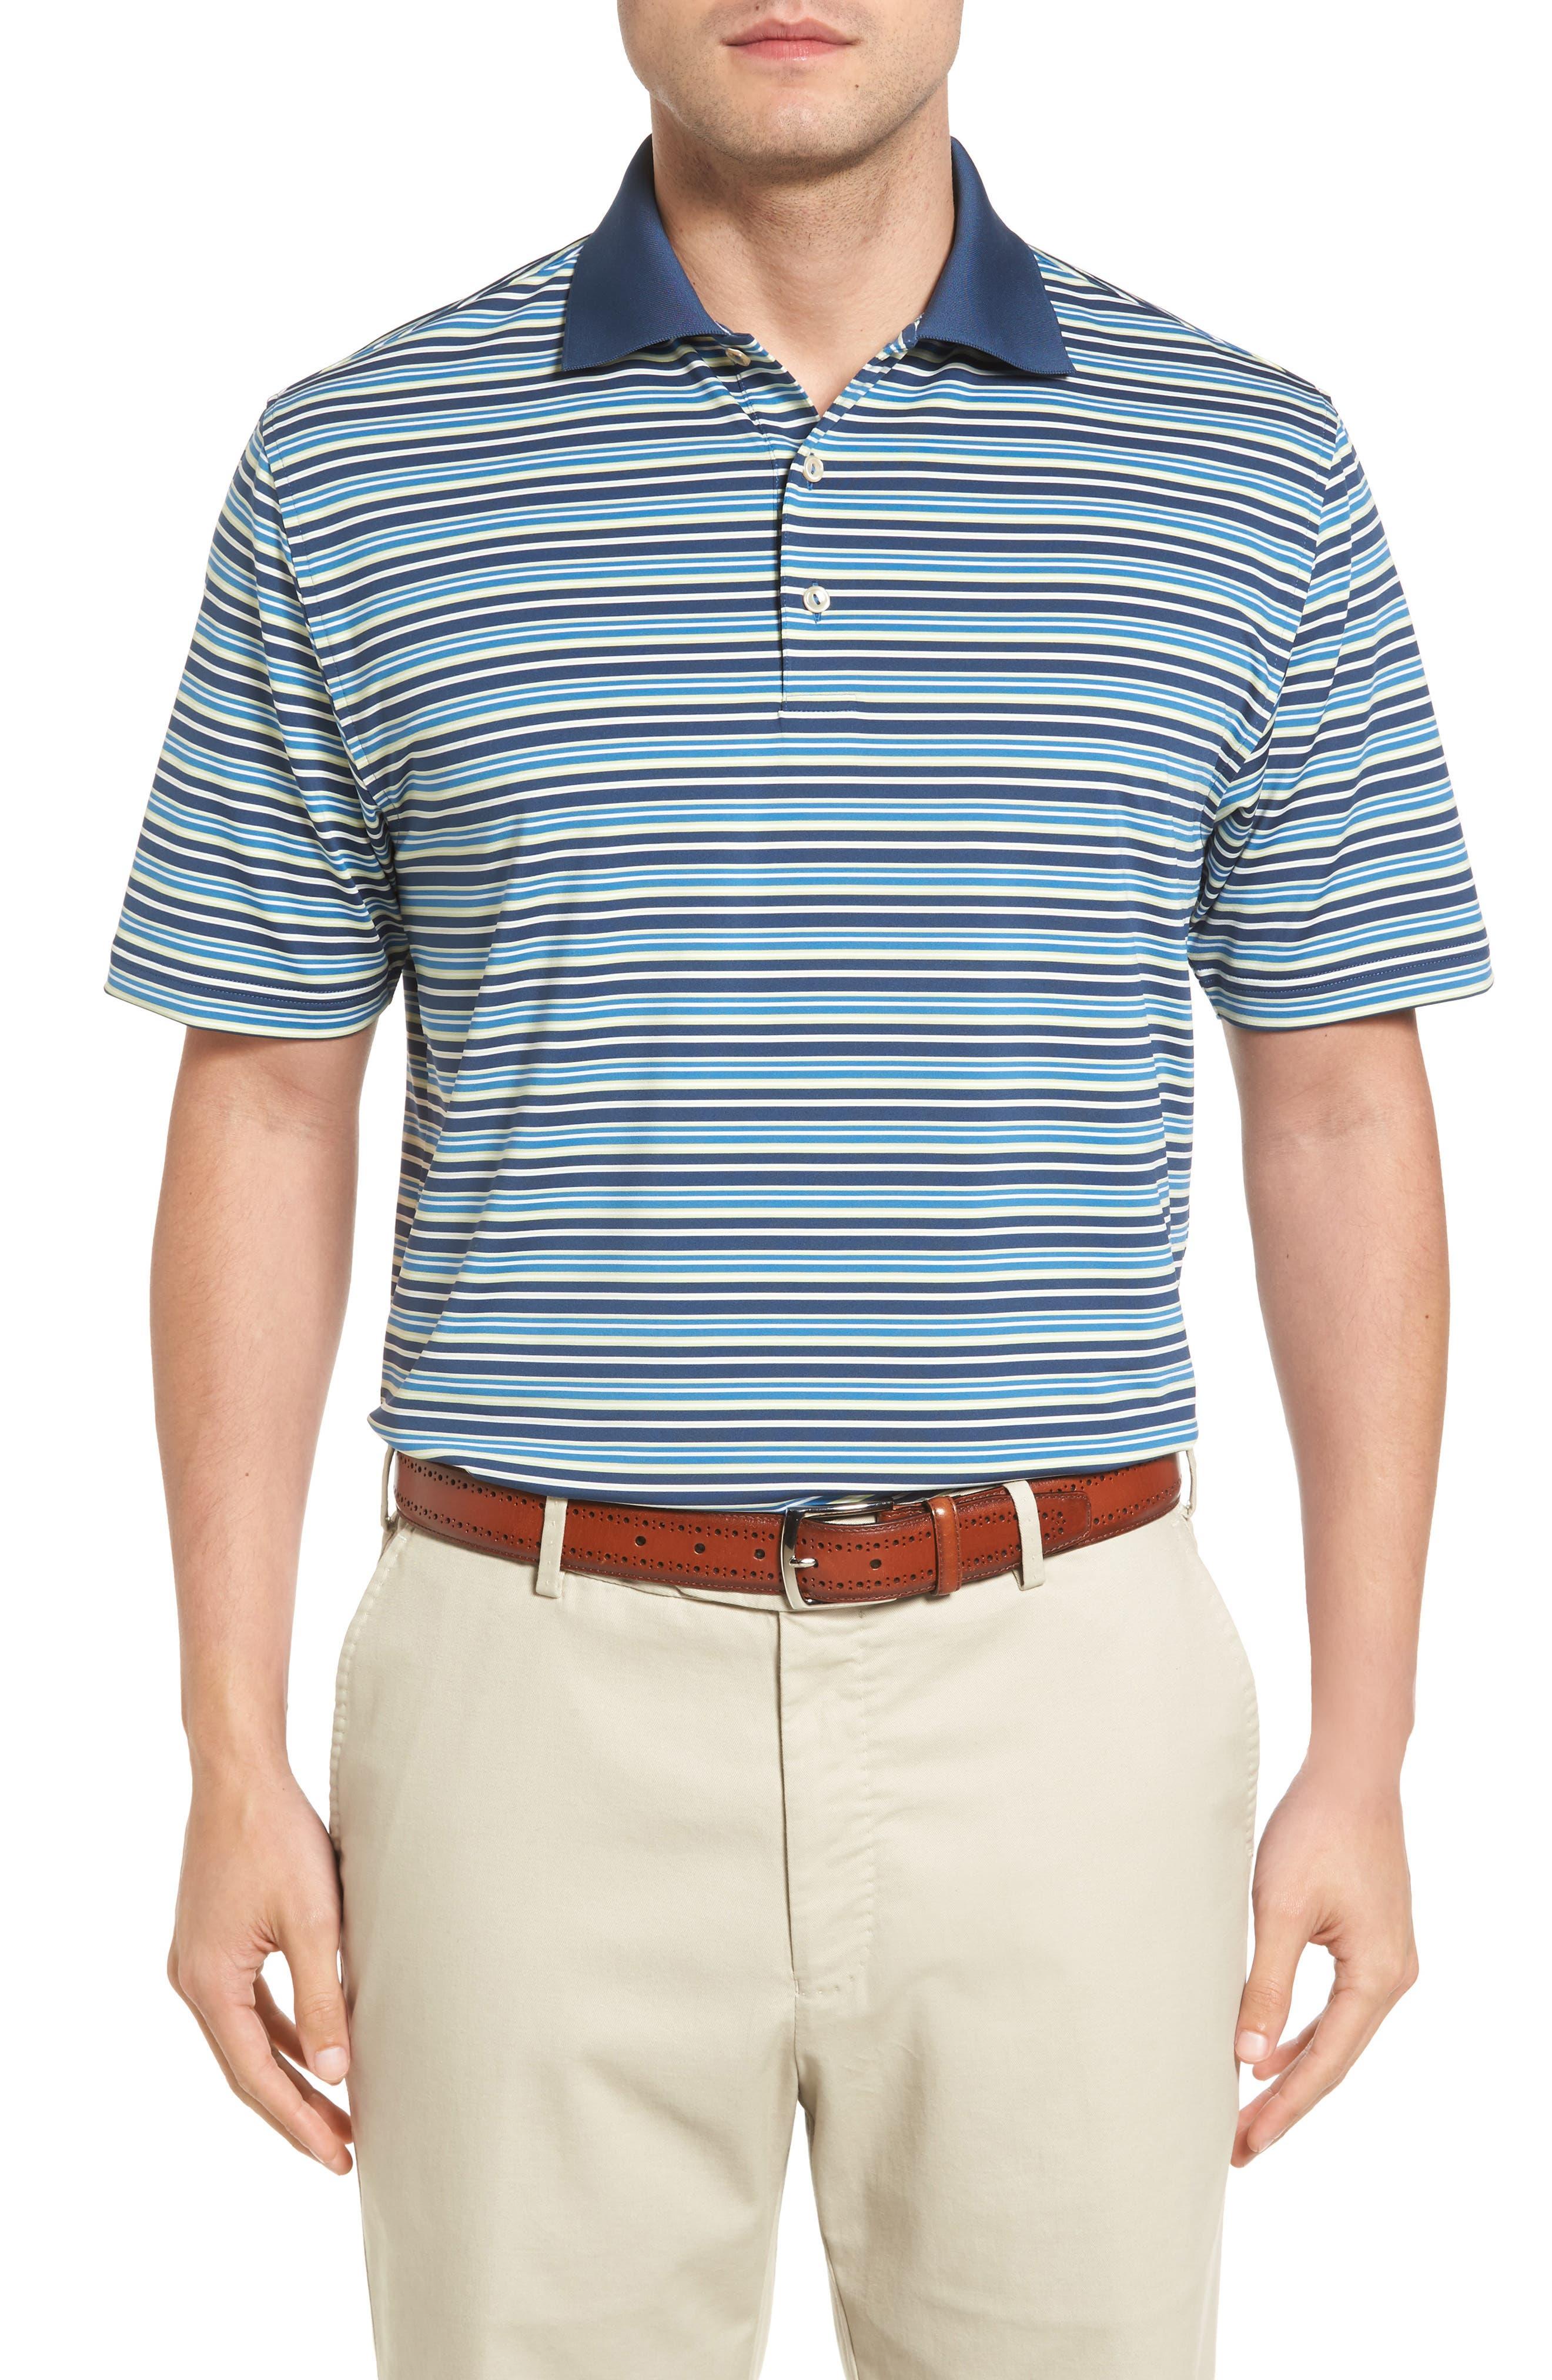 Peter Millar Pembroke Stripe Jersey Polo